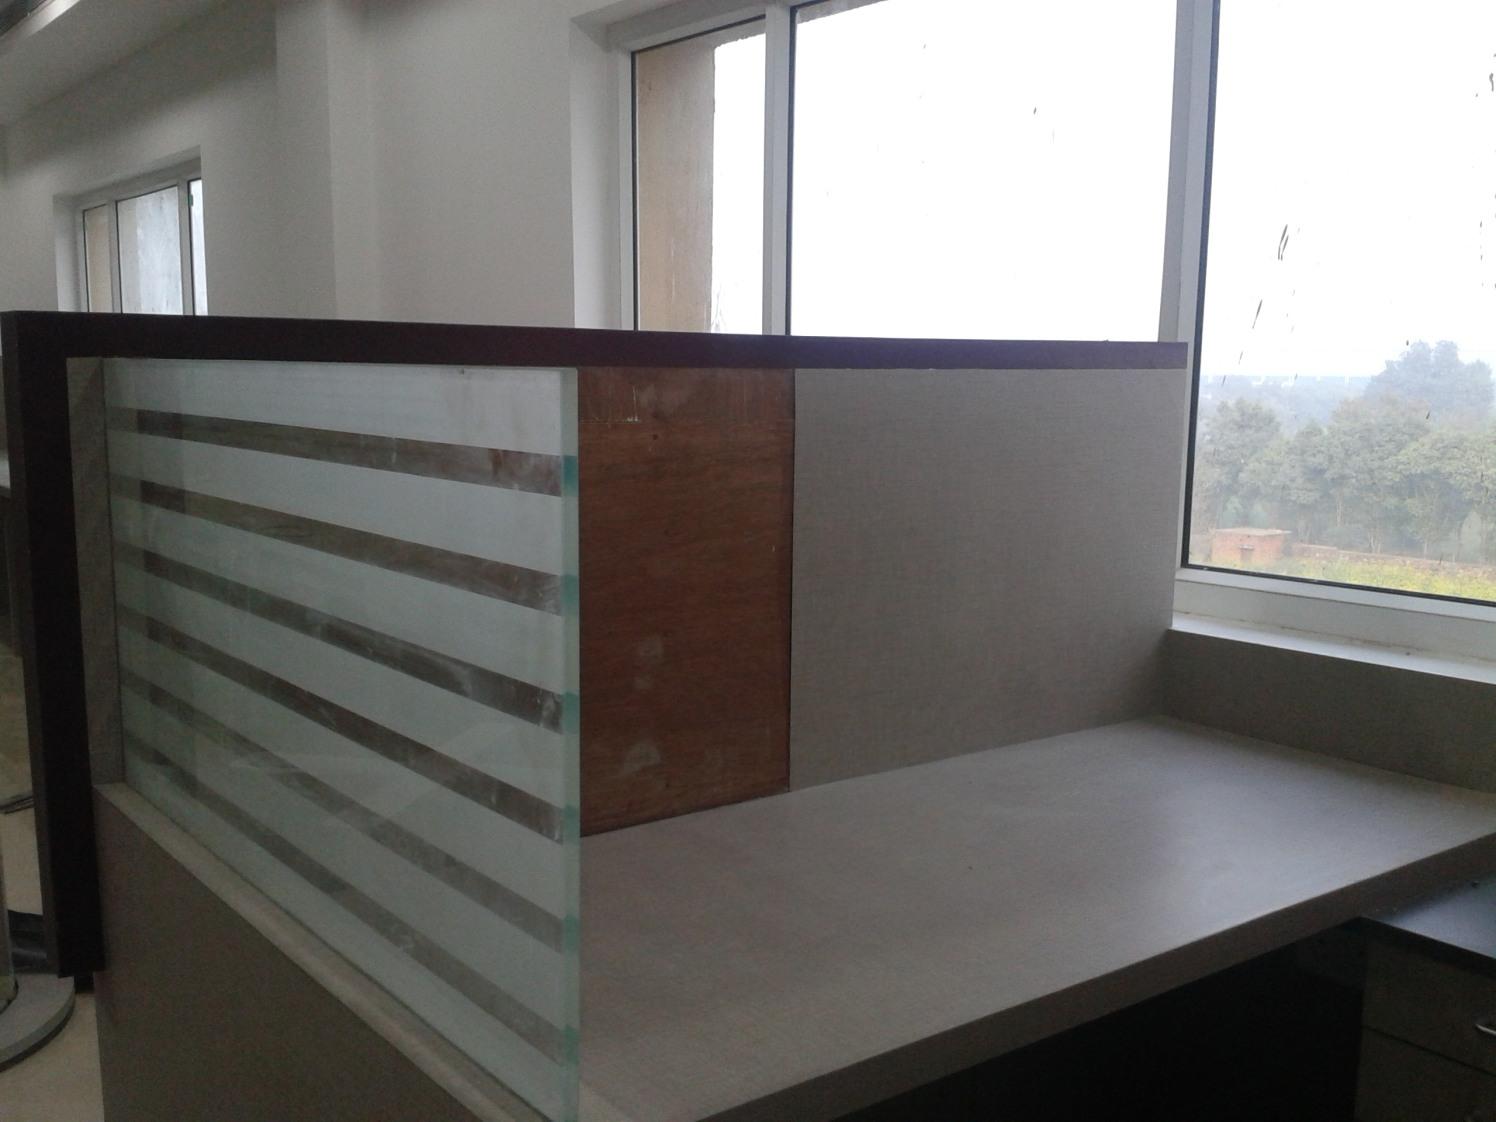 Cellular office space by rohini yadav Modern | Interior Design Photos & Ideas